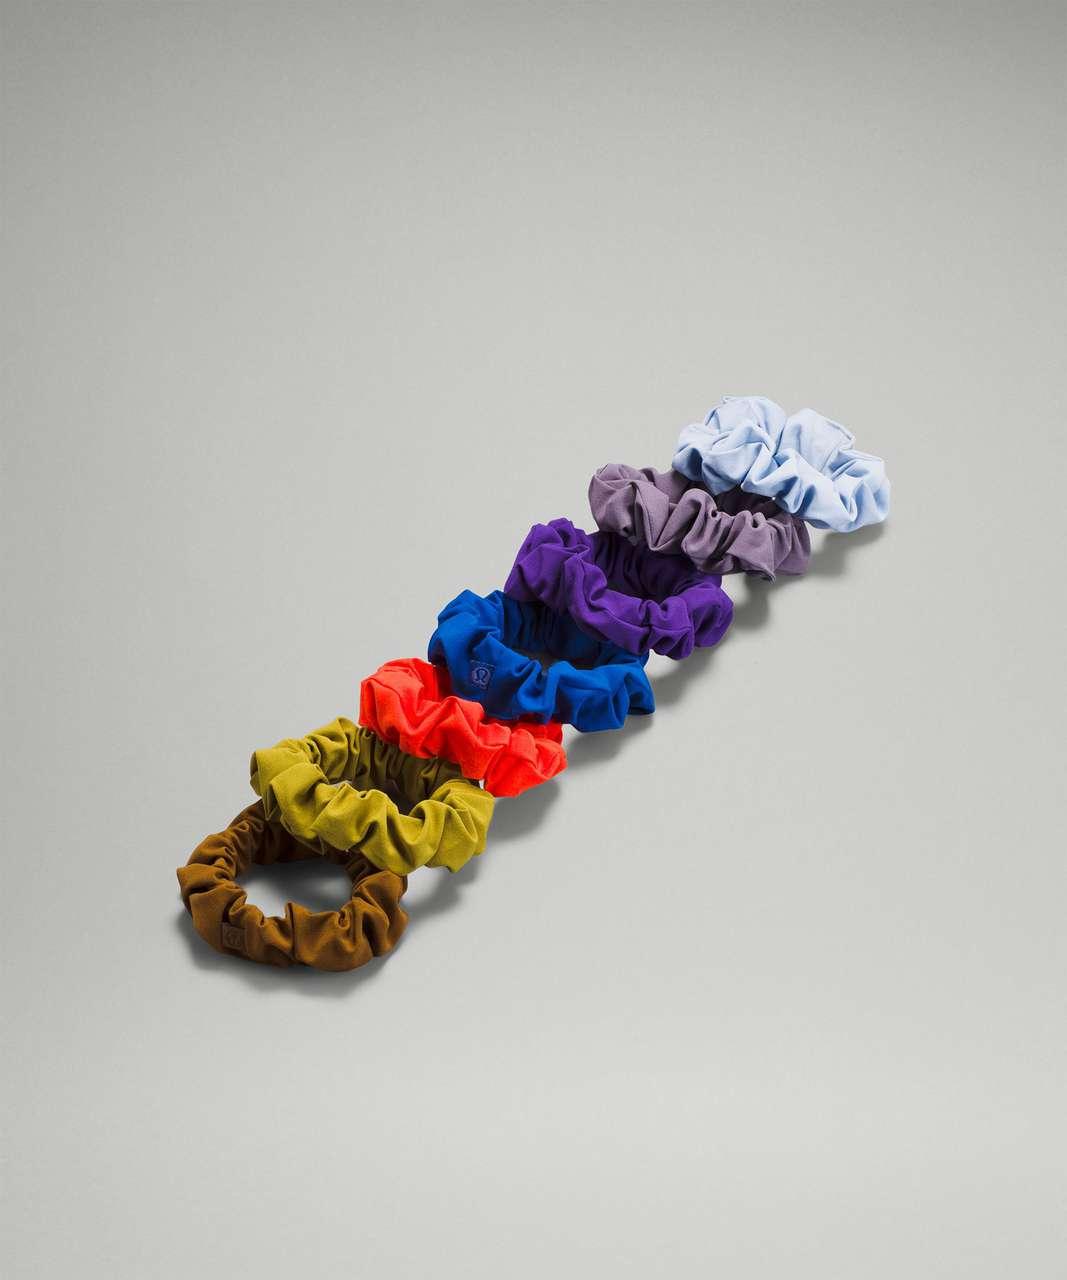 Lululemon Uplifting Scrunchie *7 Pack - Copper Brown / Auric Gold / Autumn Red / Symphony Blue / Petrol Purple / Dusky Lavender / Blue Linen